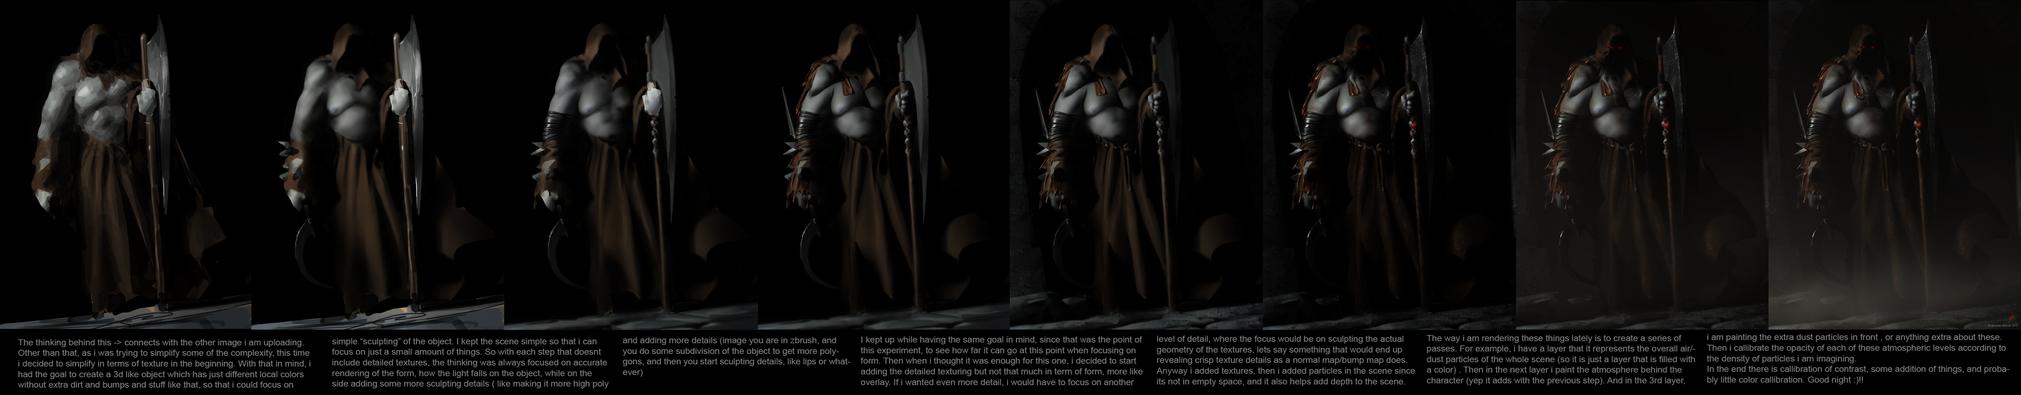 DarkWarden-Process by kingkostas